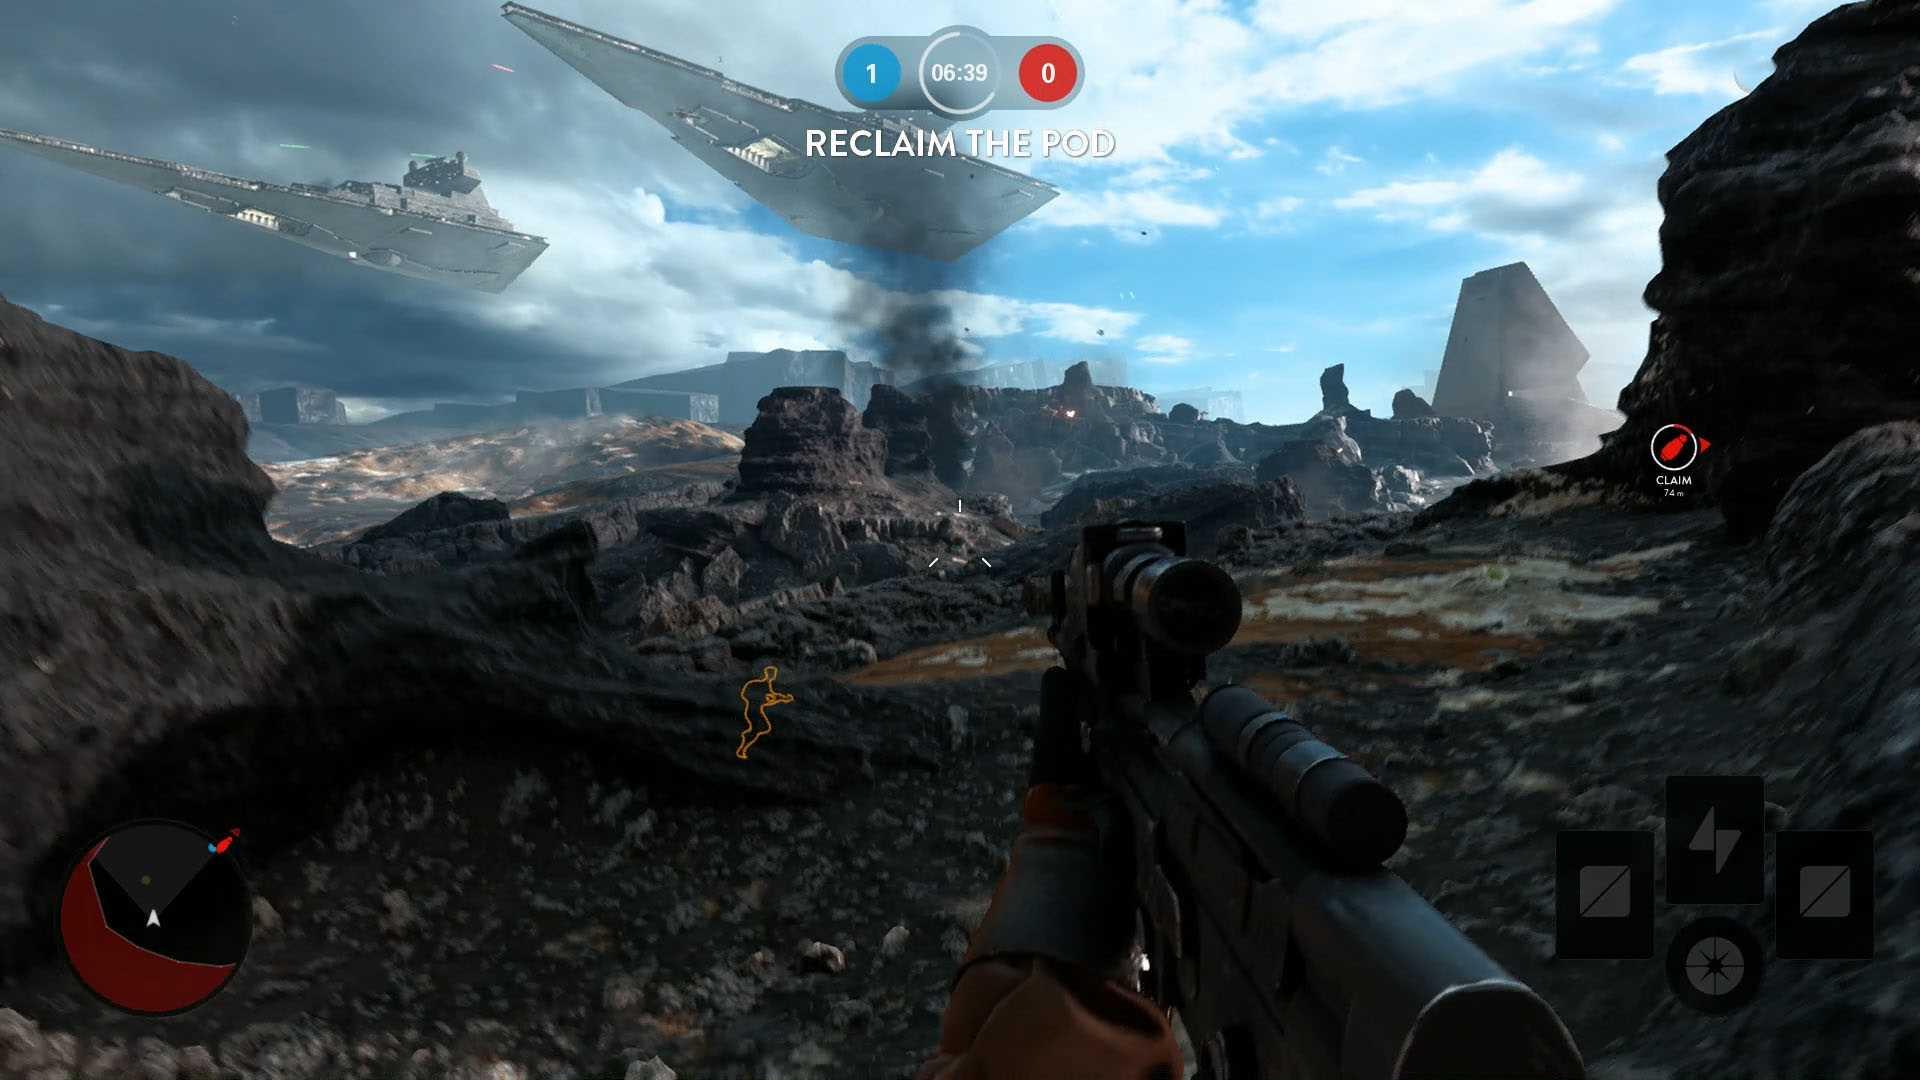 Screenshots capture d 39 ecran pour star wars battlefront for Capture d42cran